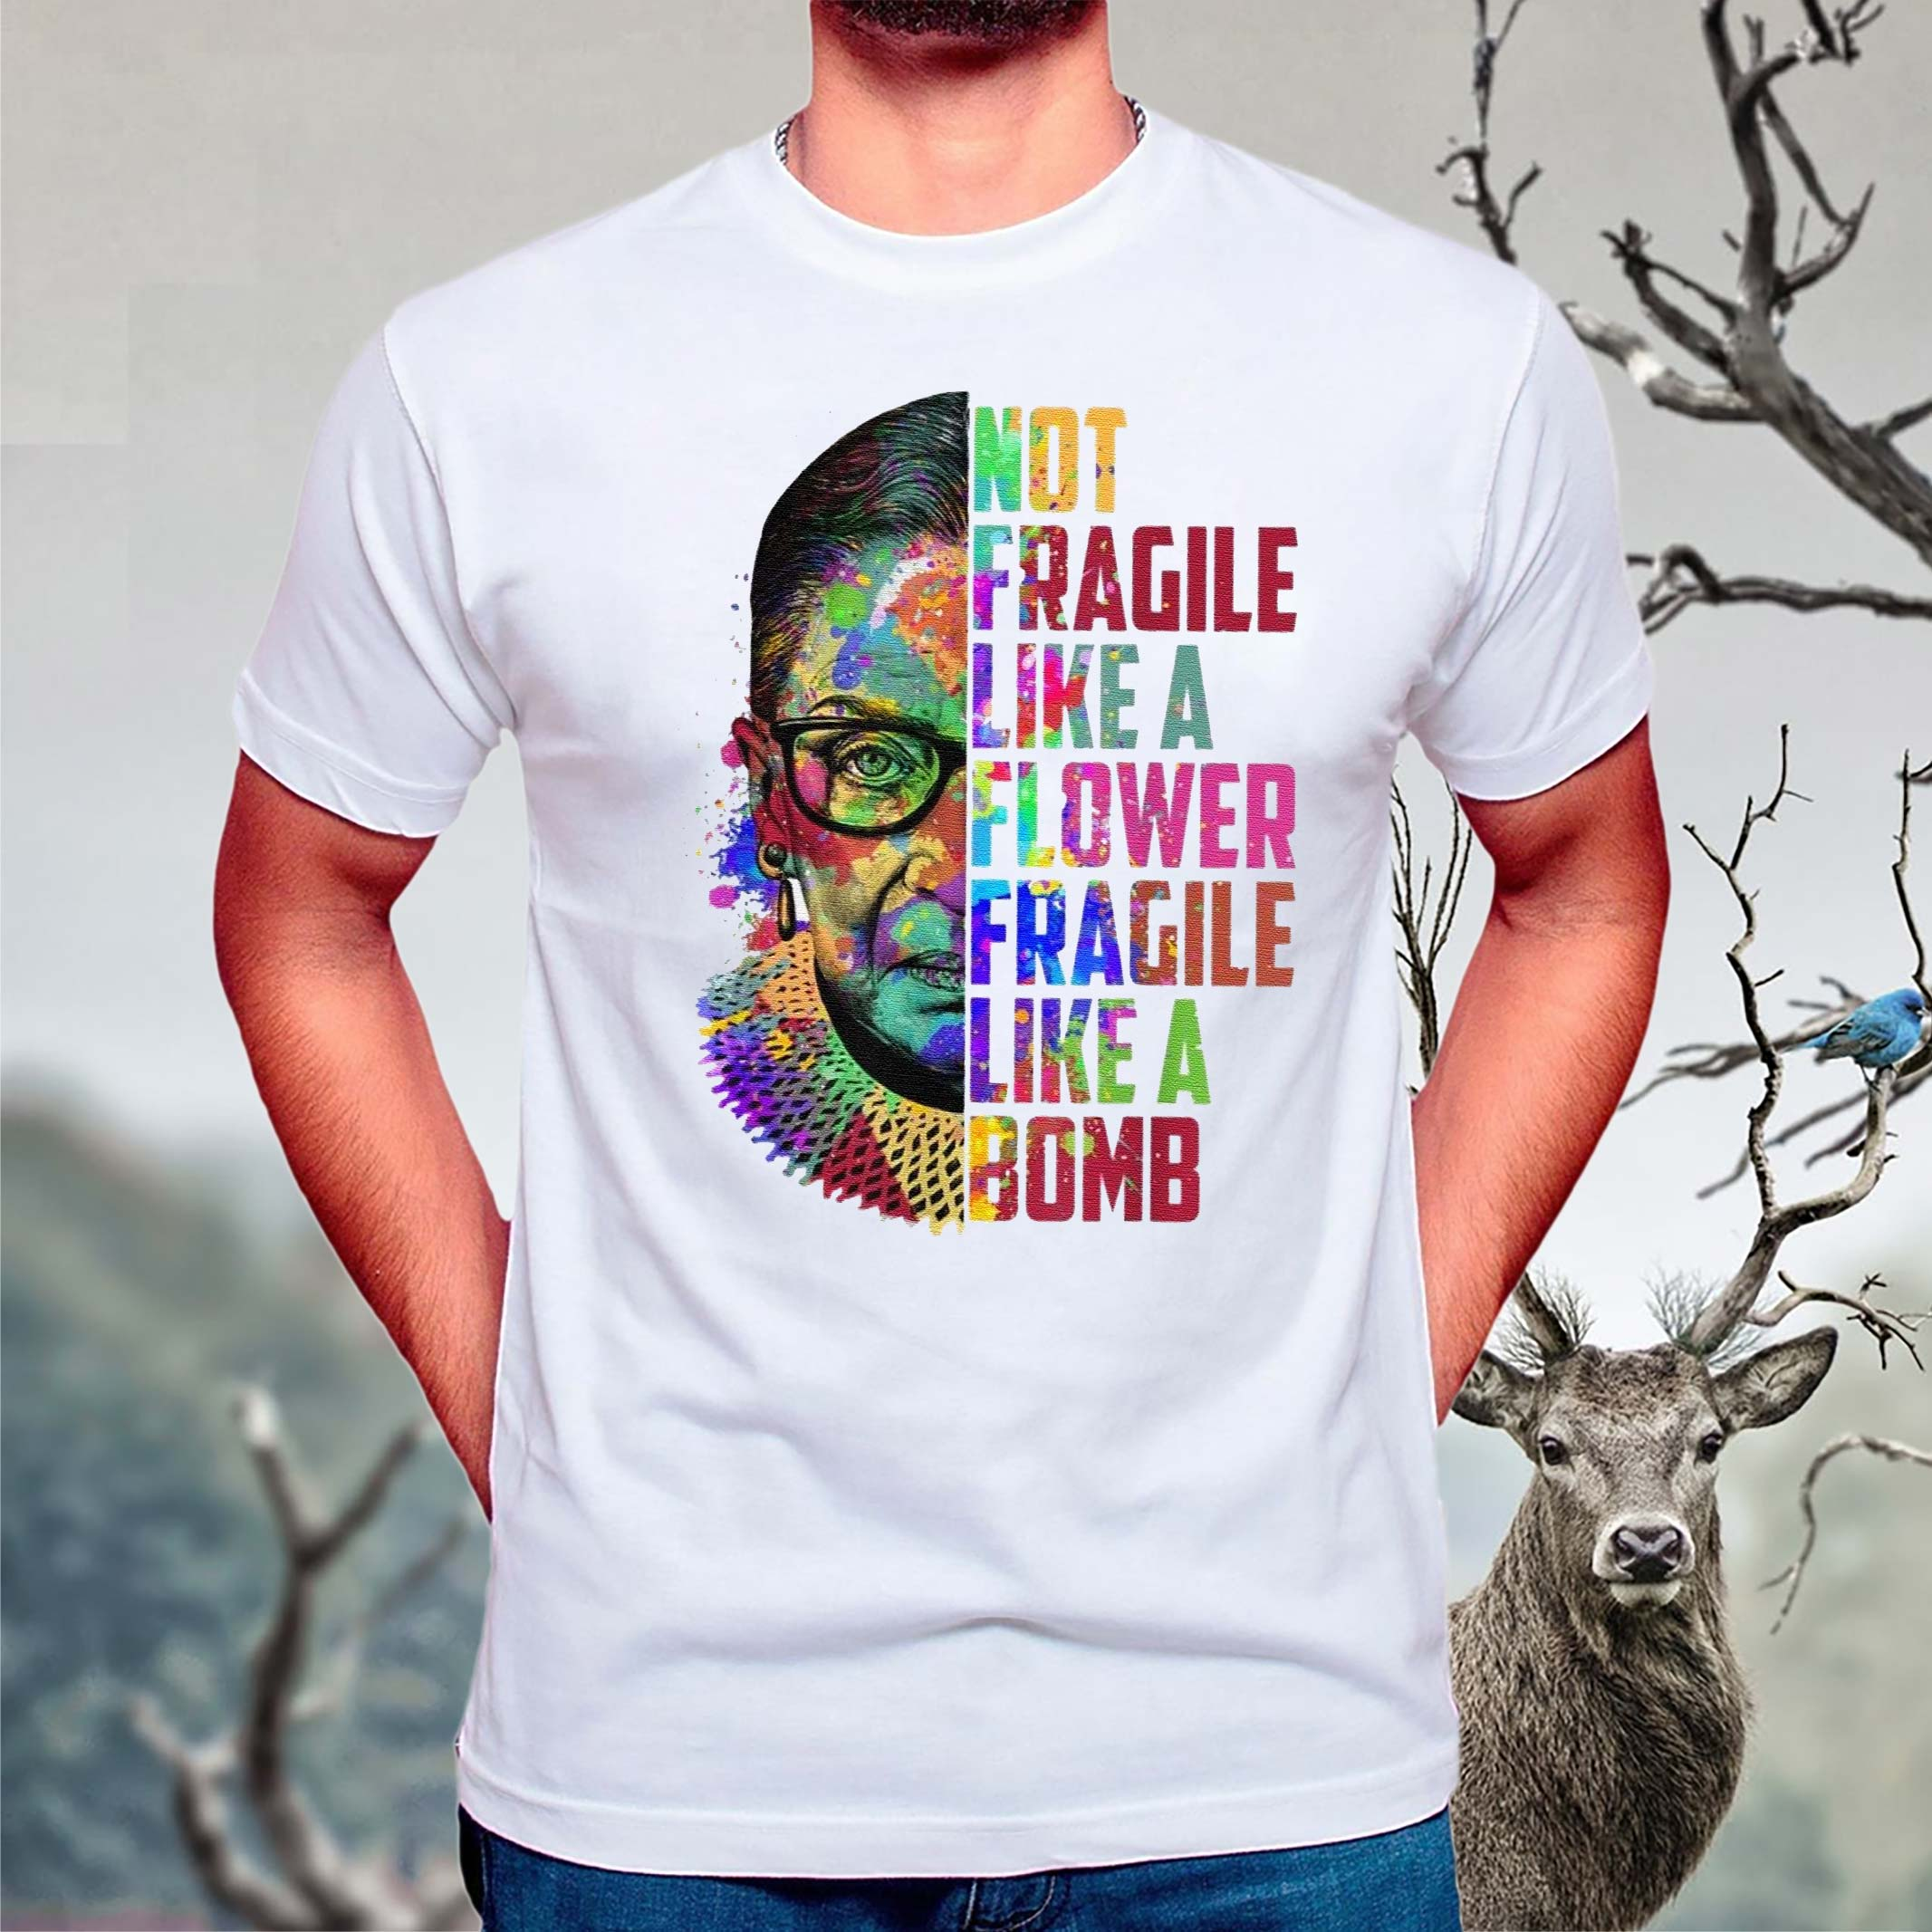 rbg-shirt-not-fragile-like-a-flower-fragile-like-a-bomb-t-shirt